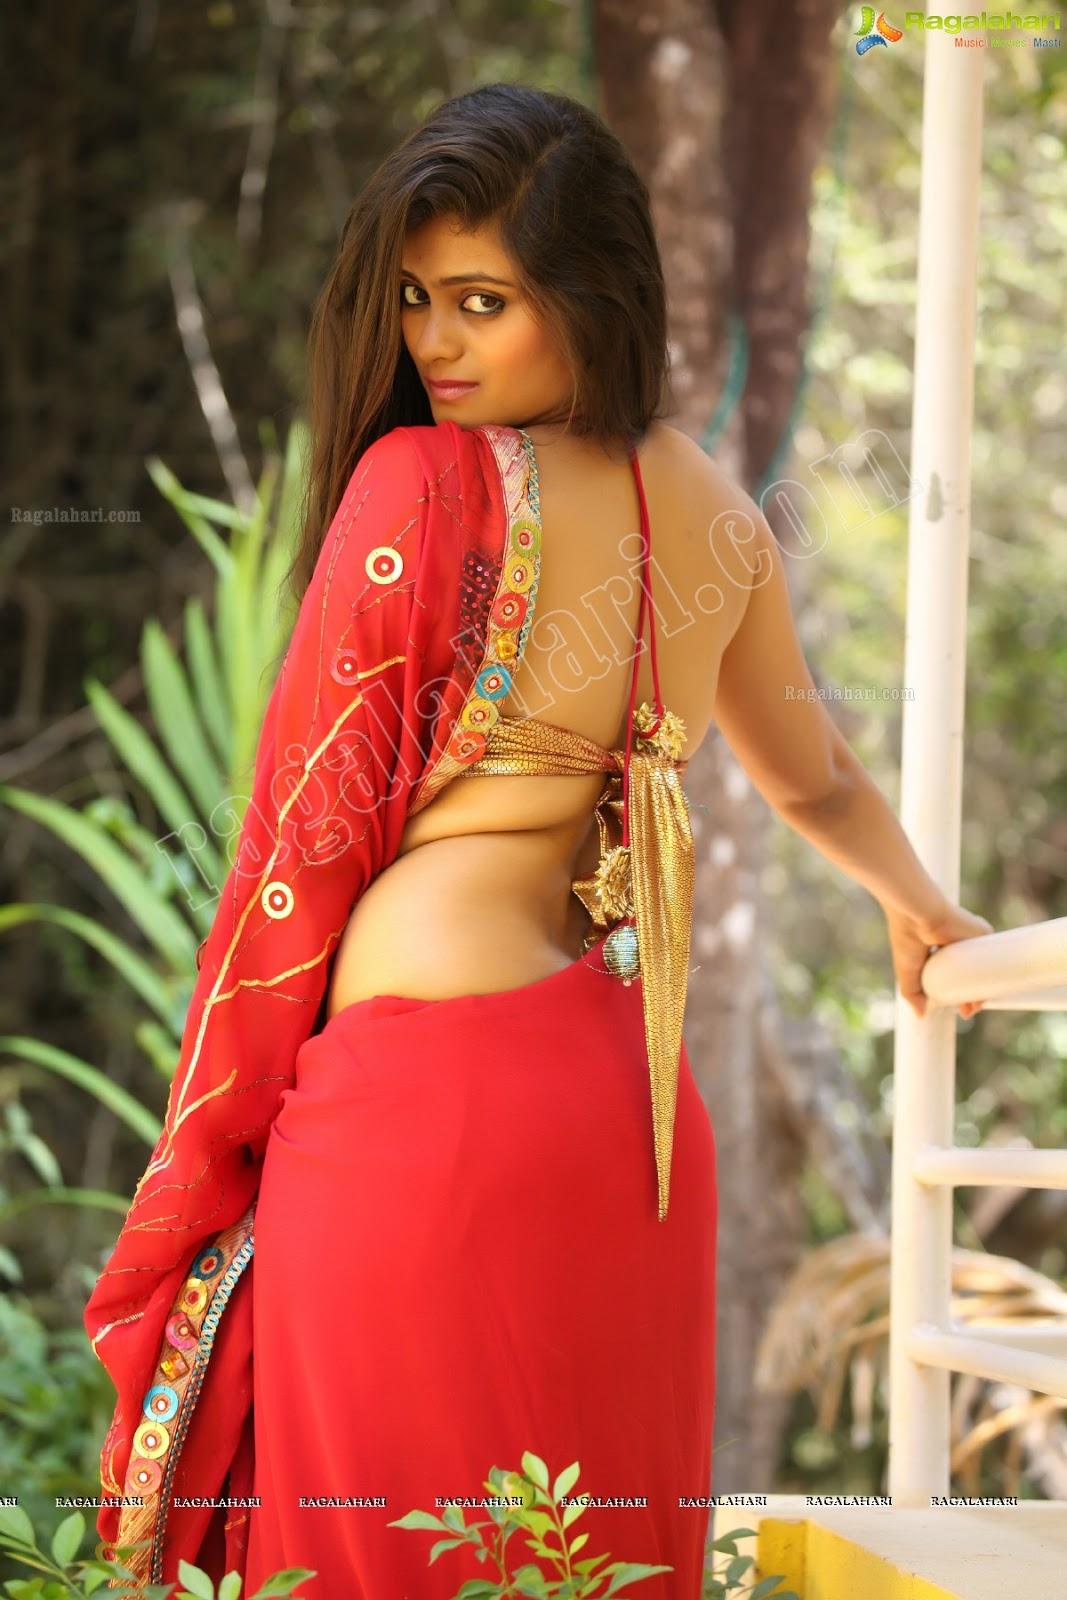 Tamil Hot Talks: Sheetal - Hot Indian Model